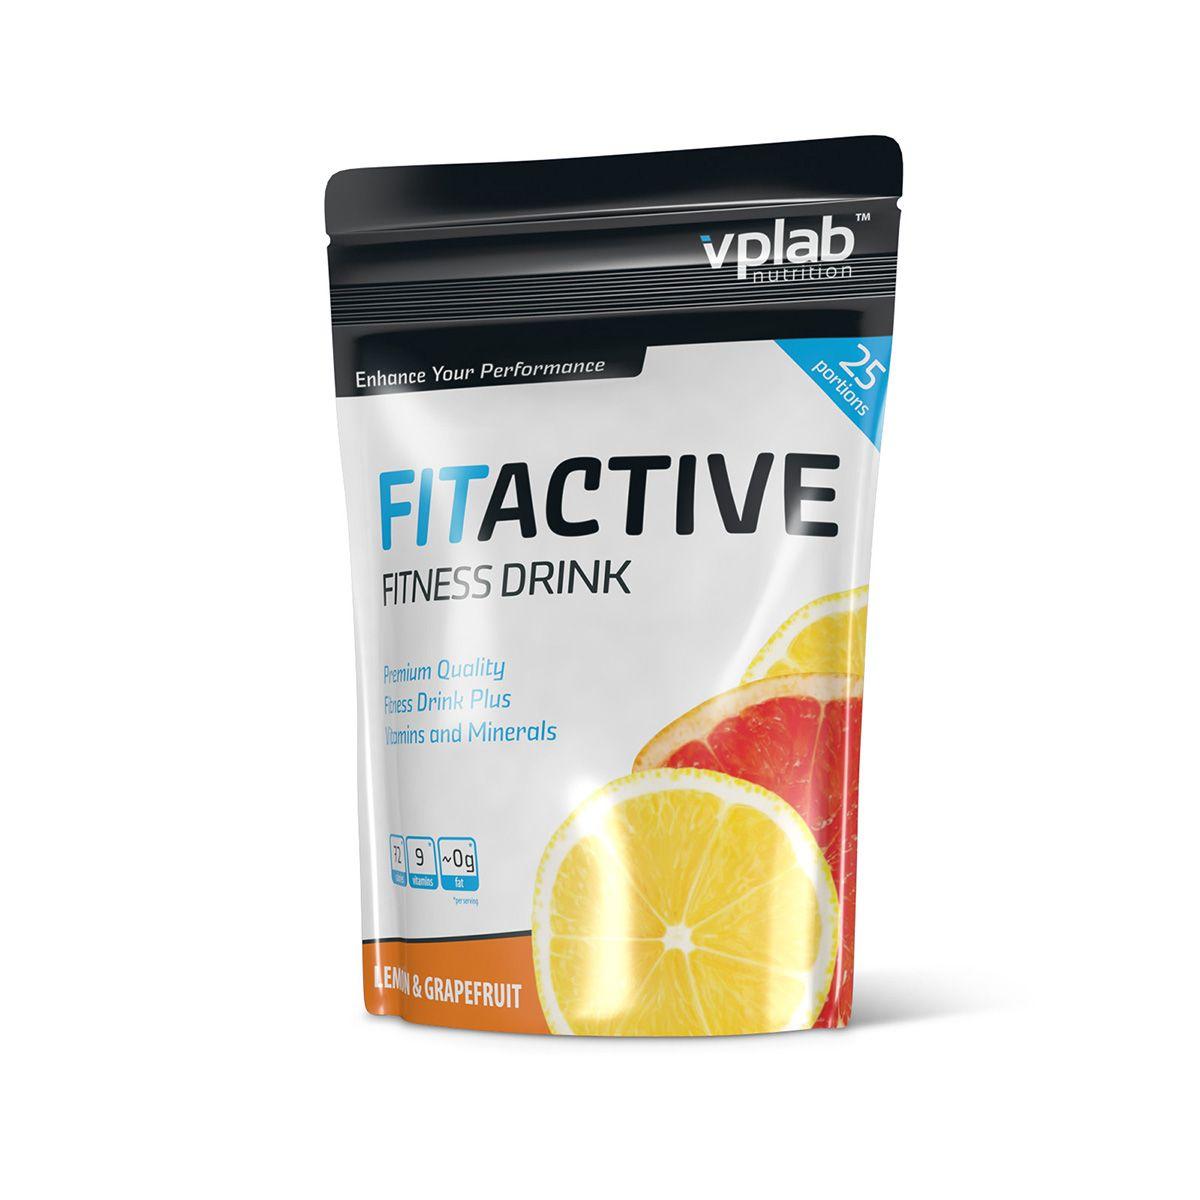 Изотоник Vplab Fitactive Fitness Drink, лимон-грейпфрут, 500 г овестин крем 1 мг г 15 г